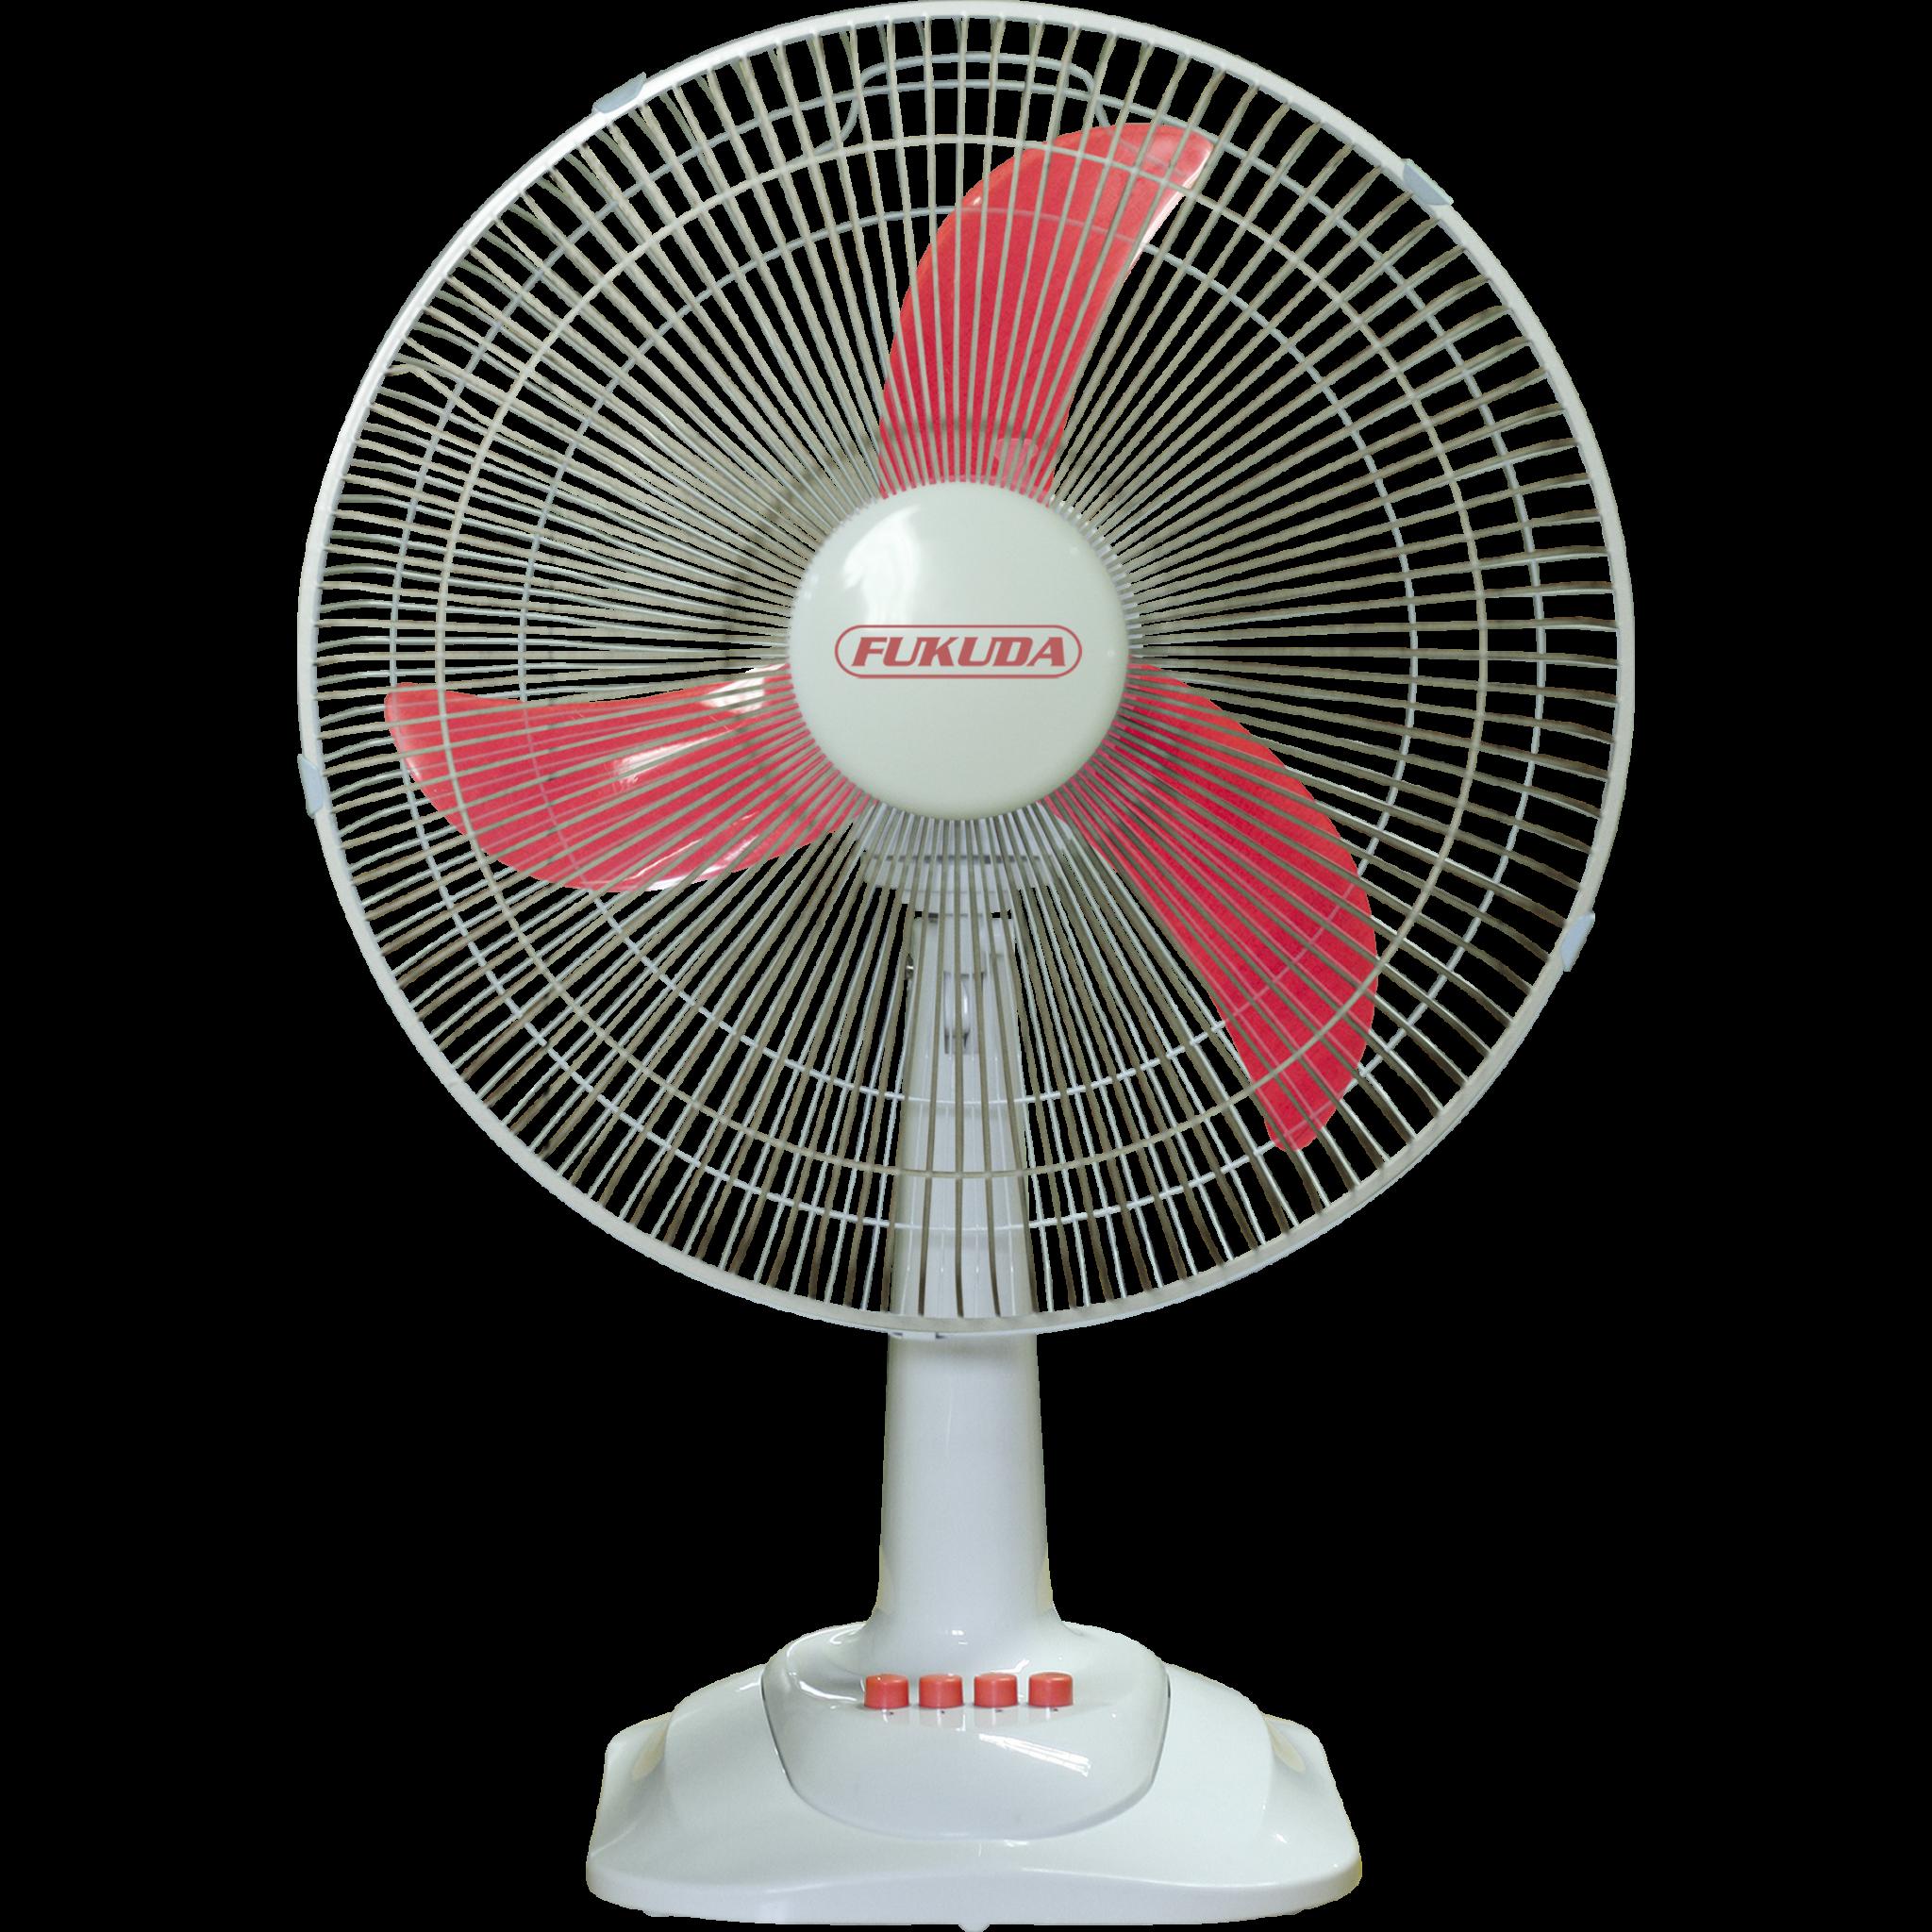 Png hd mart. Furniture clipart electric fan